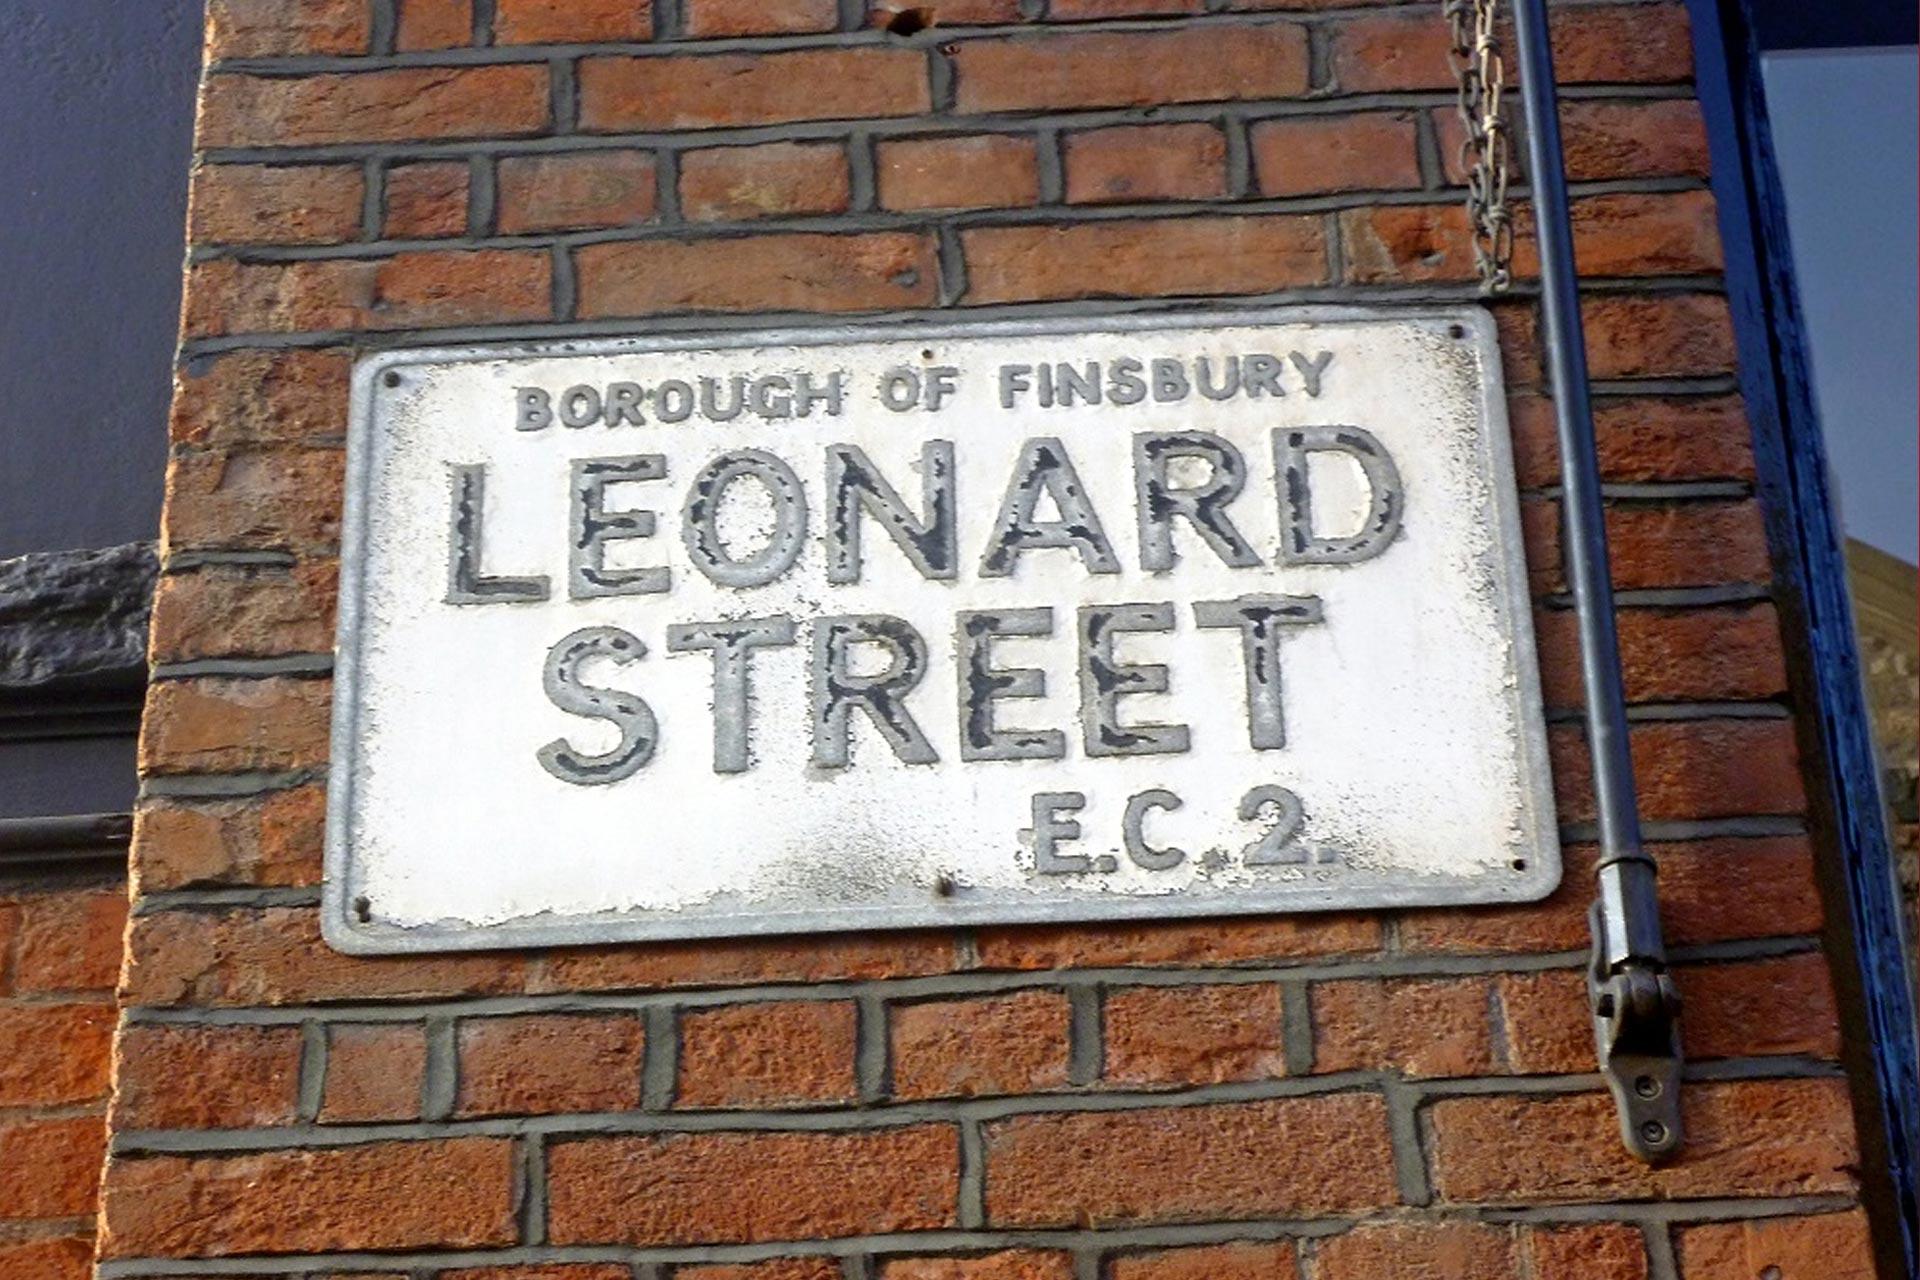 Leonard Street